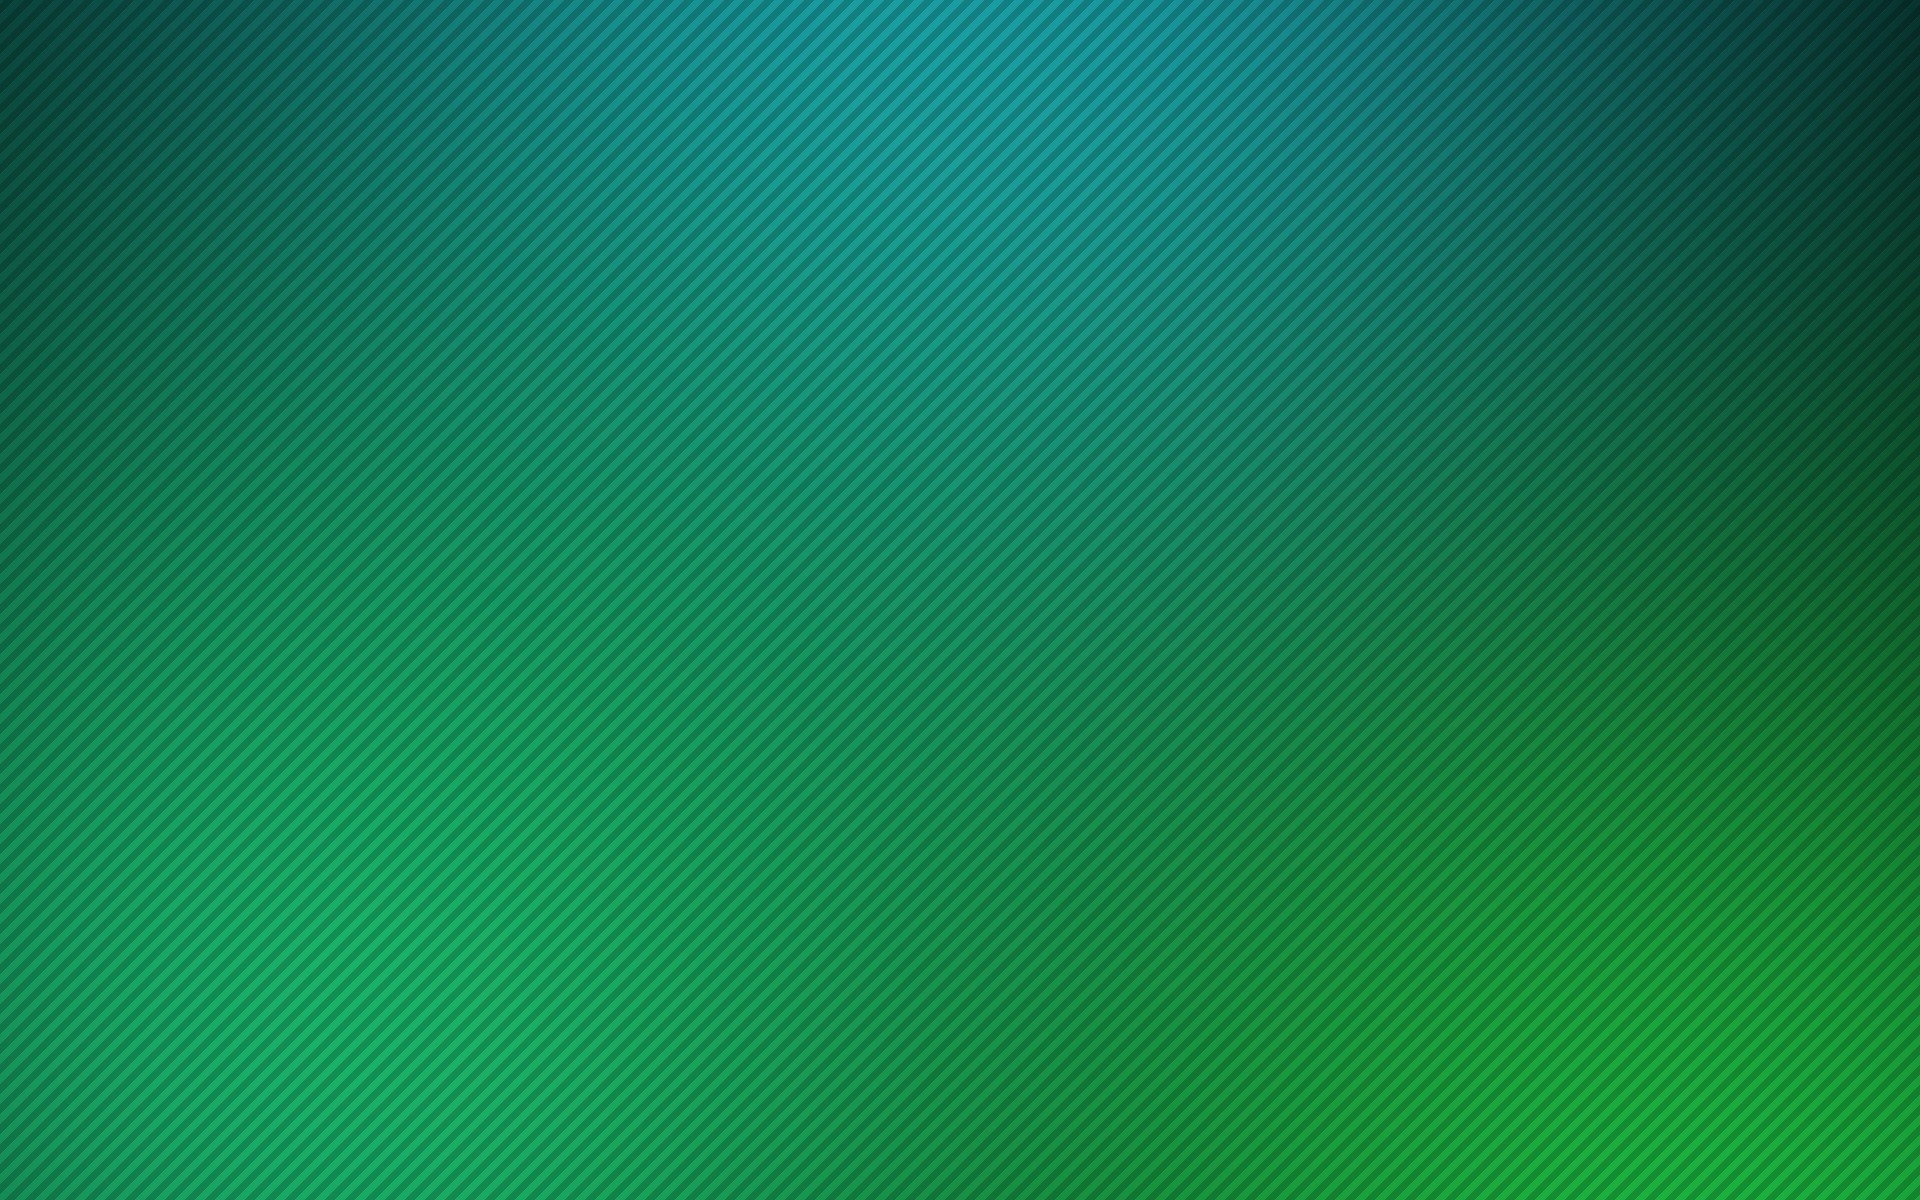 Textura verde turquesa - 1920x1200